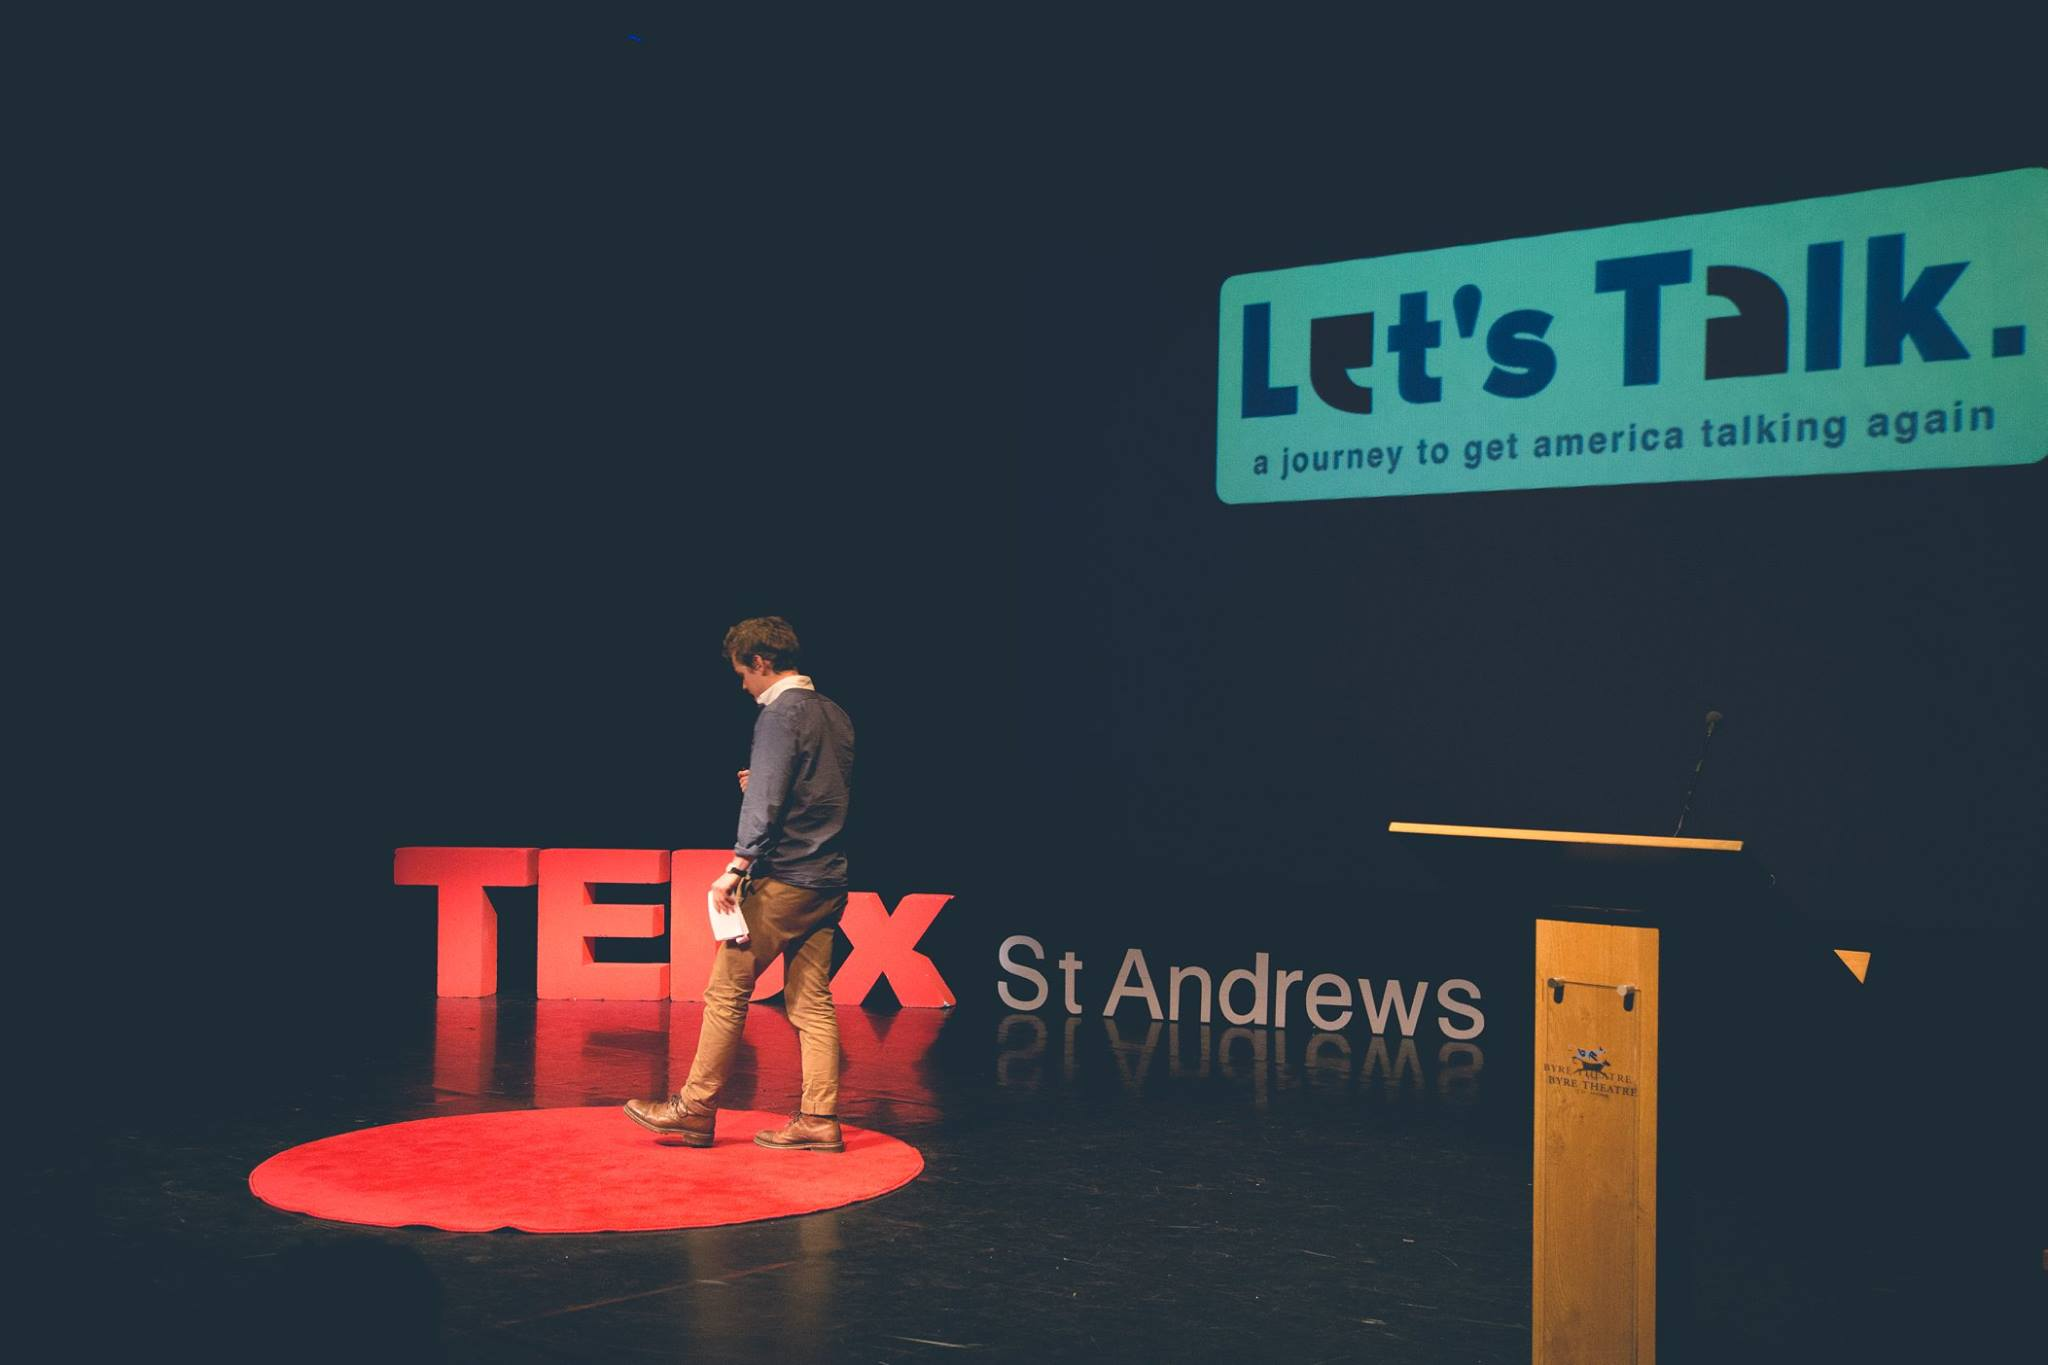 Photo from Tedx 7.jpg